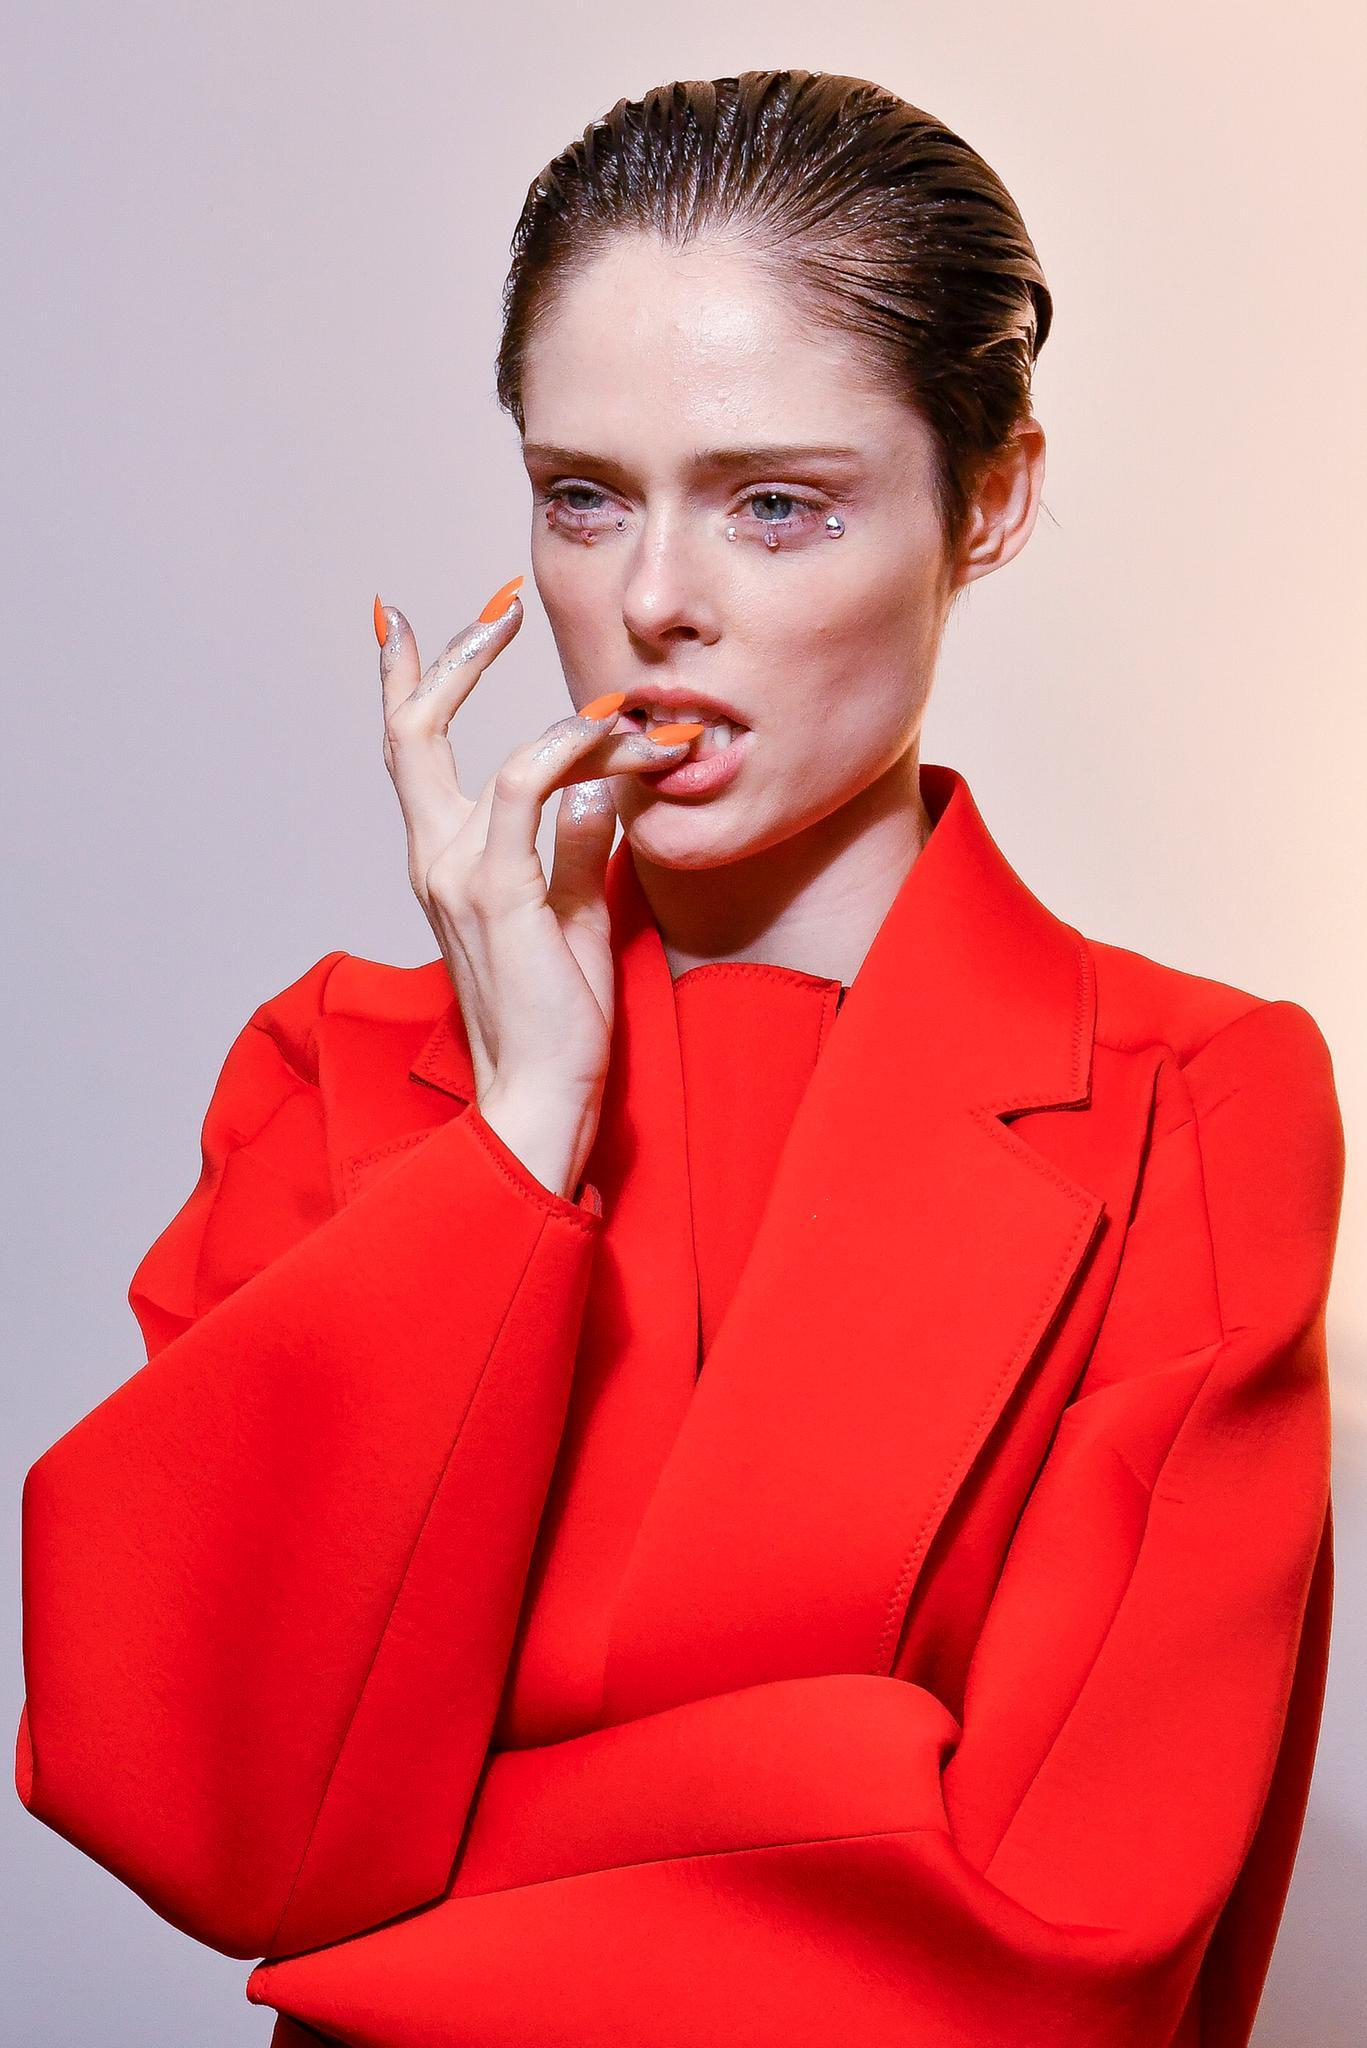 Modell mit orangenem Nagellack